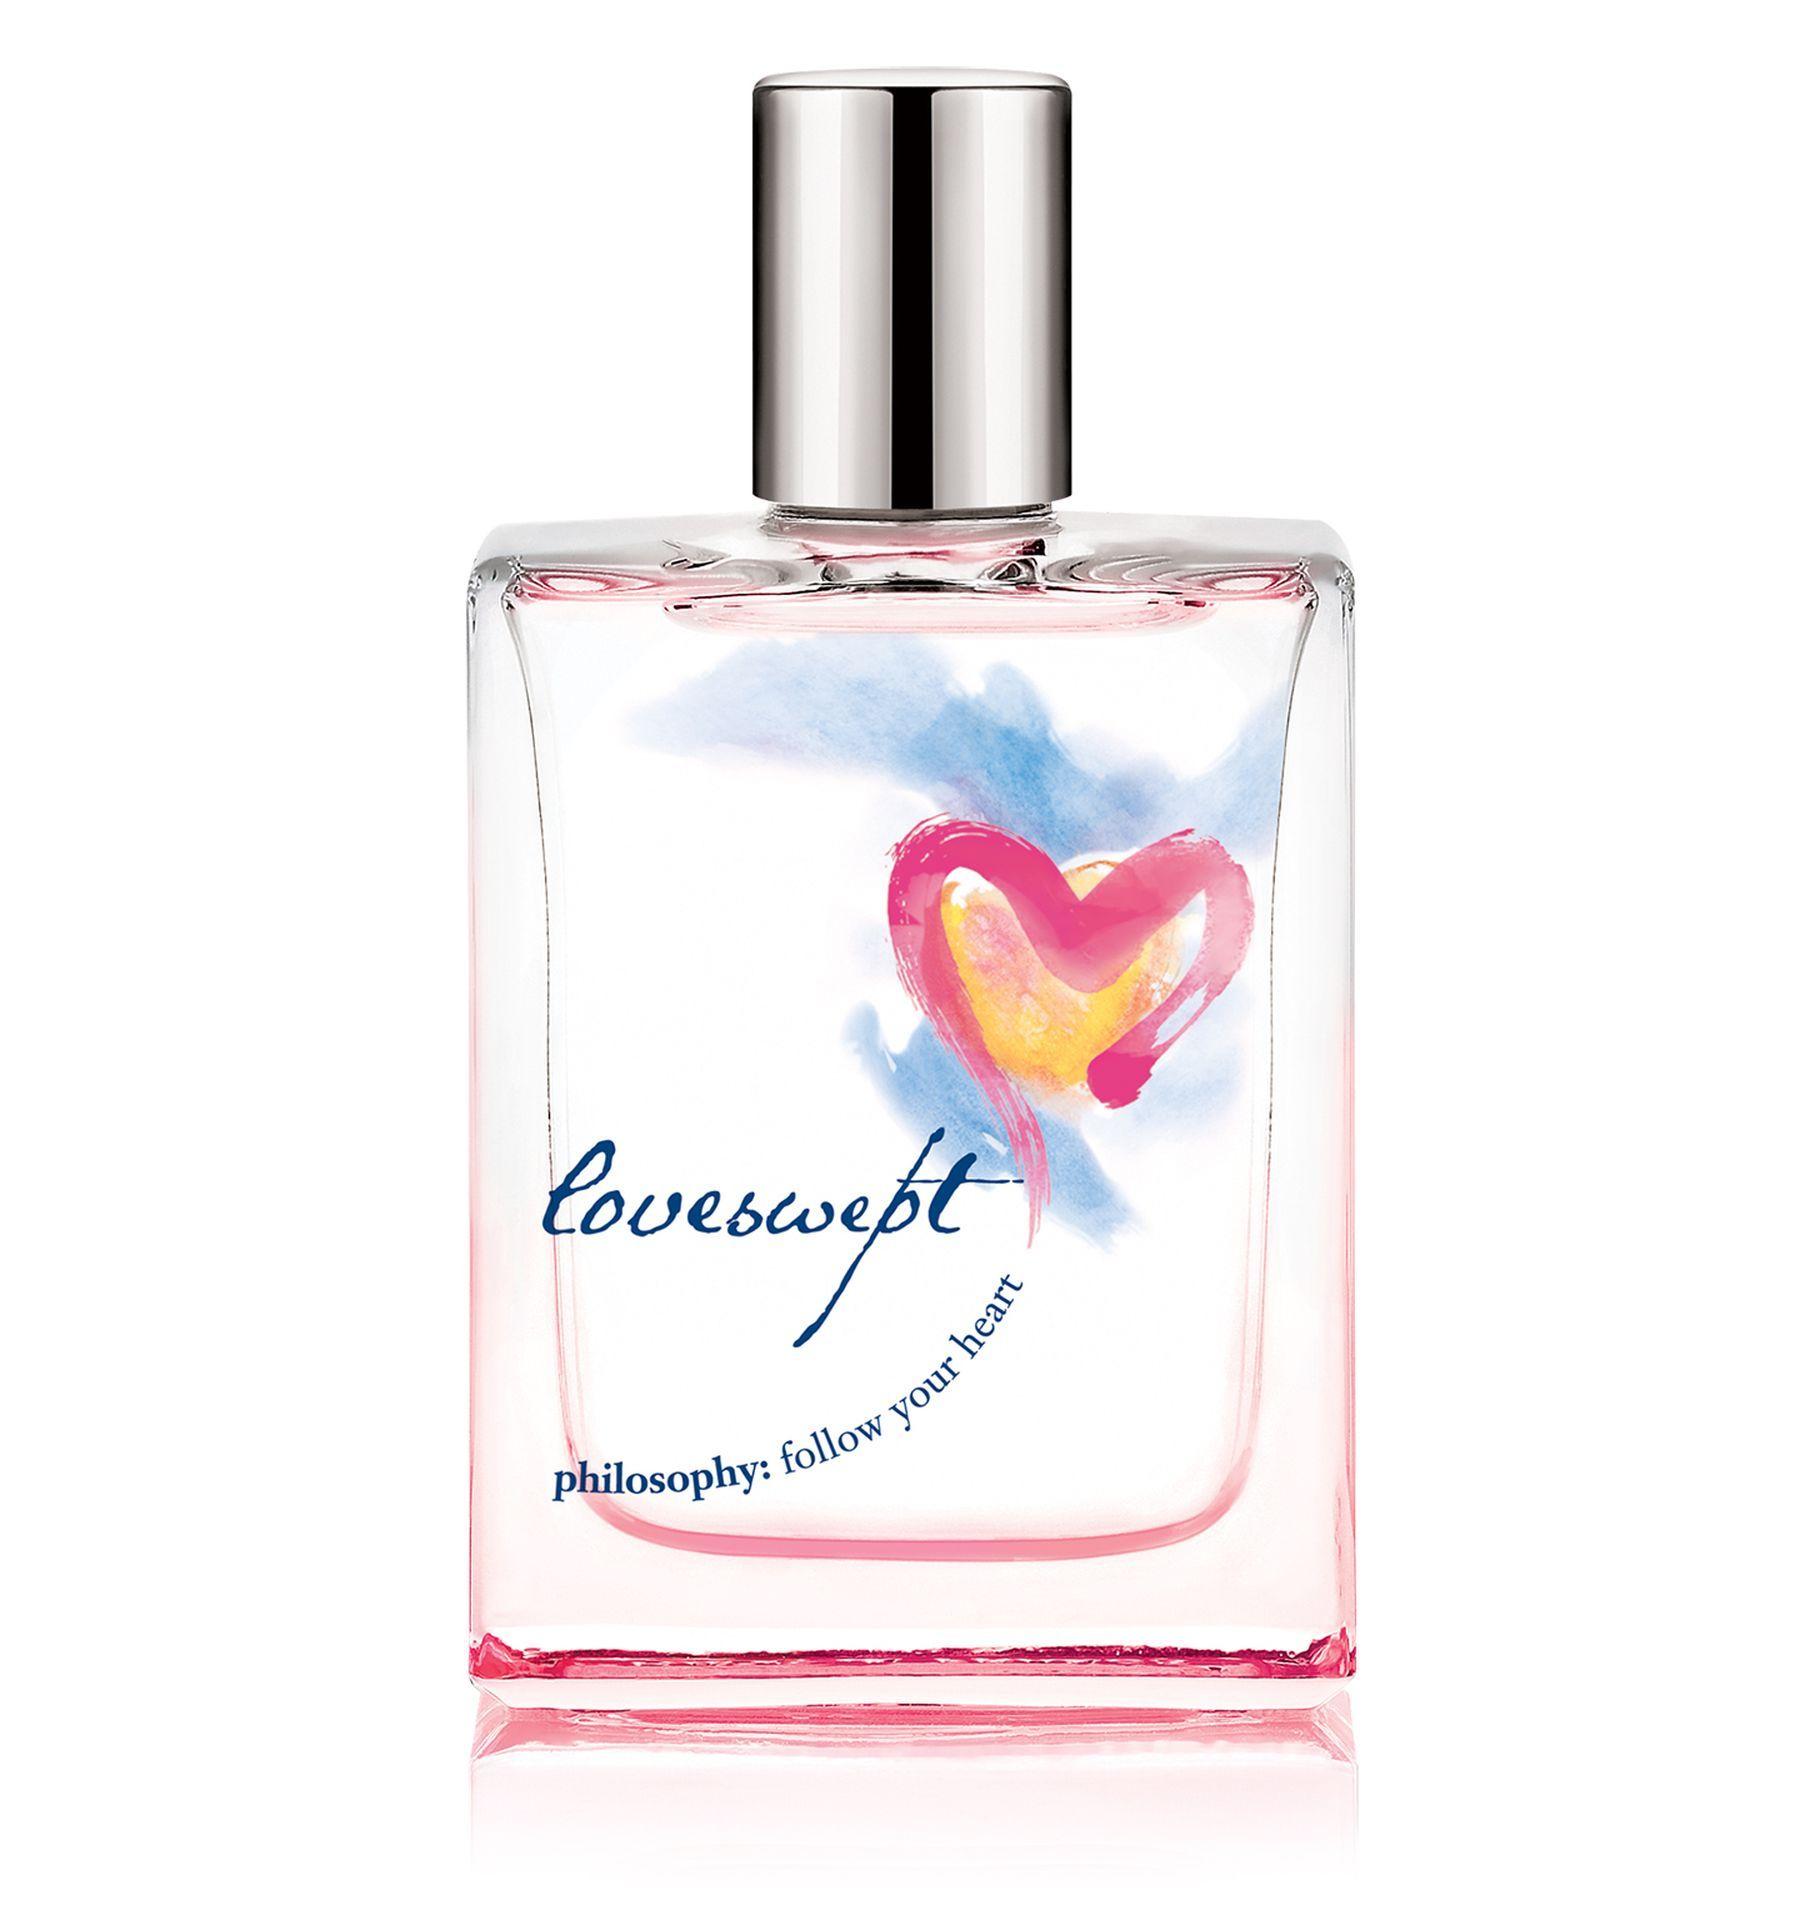 Loveswept spray fragrance fragrance spray philosophy